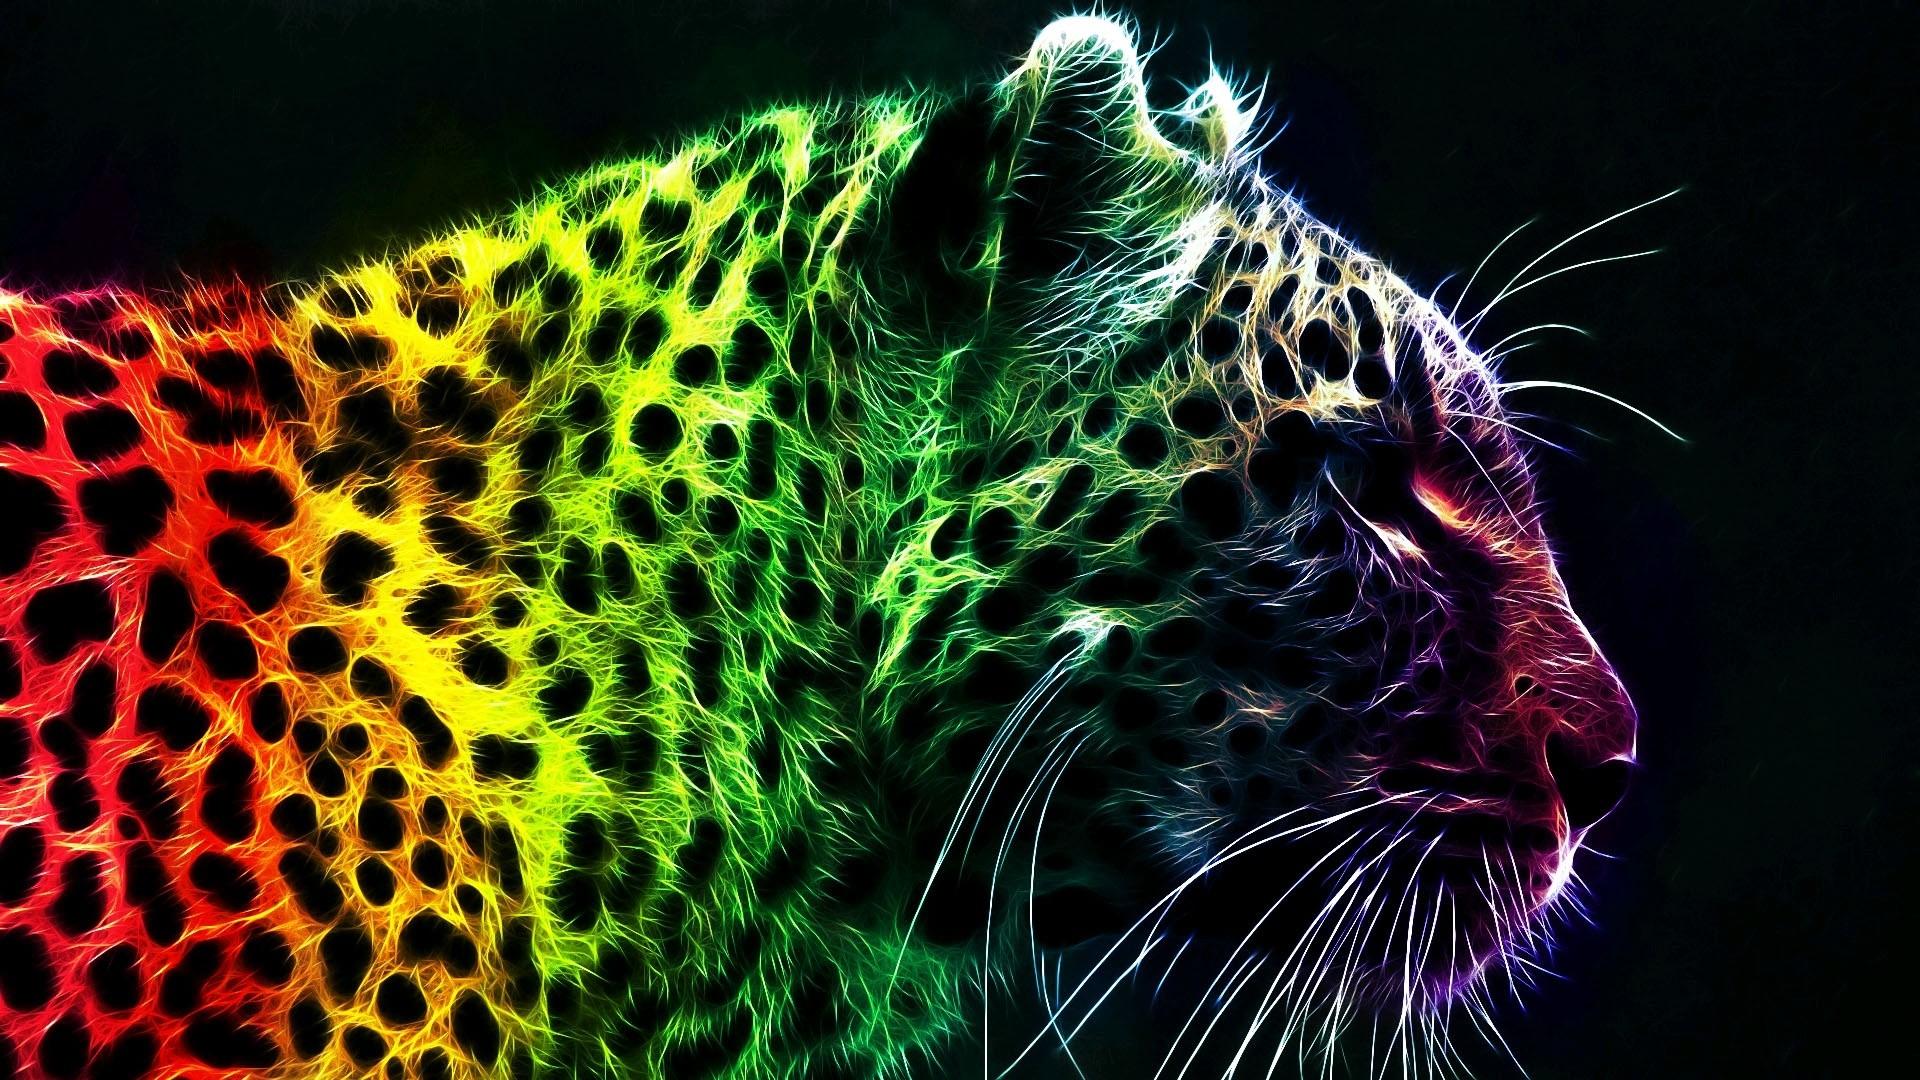 5. leopard-print-wallpaper5-600×338